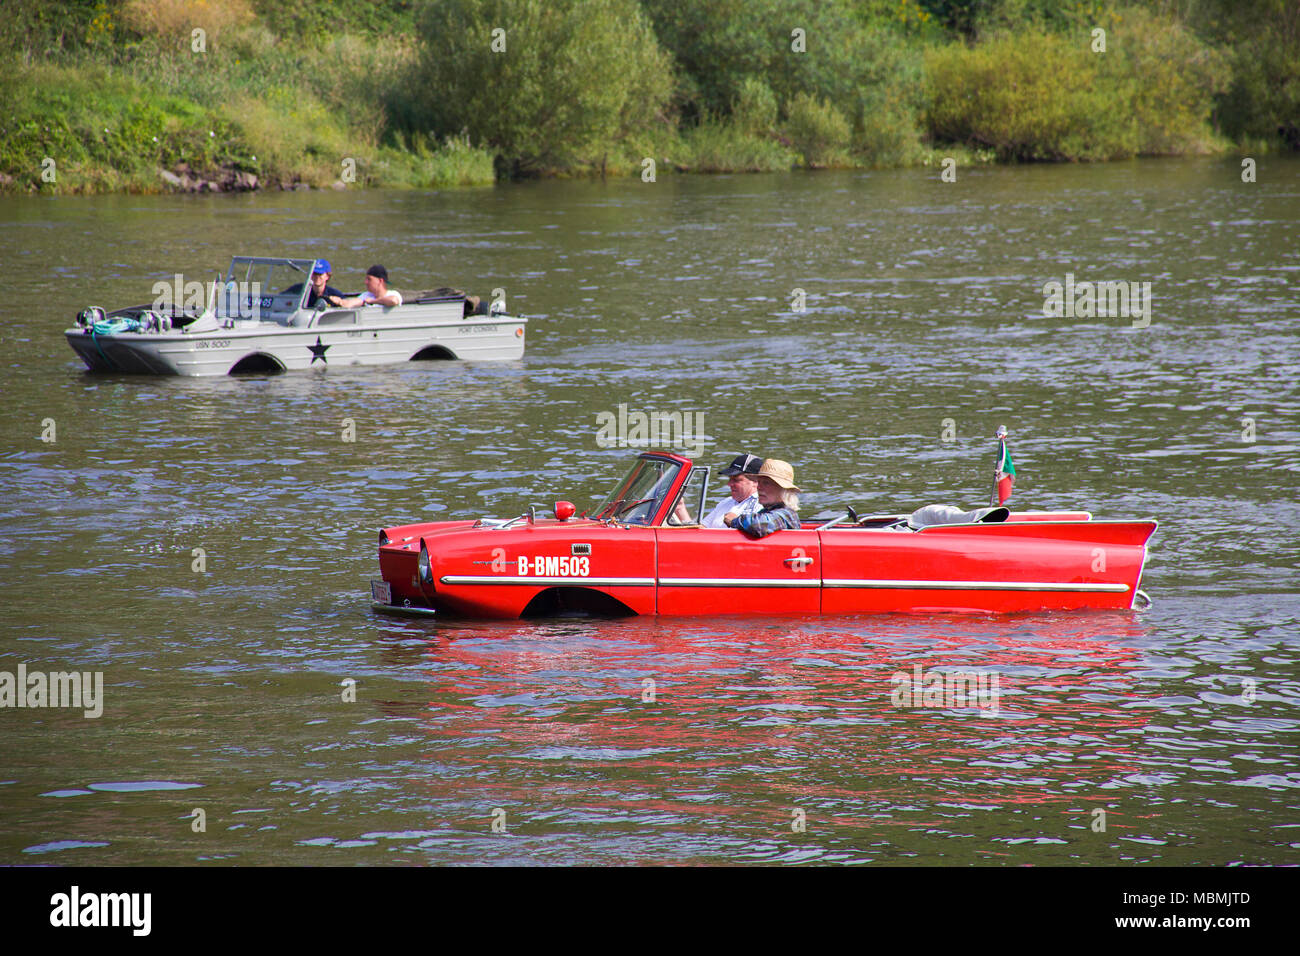 Amphic car and military amphibious vehicle on Moselle river at Cochem, Rhineland-Palatinate, Germany Stock Photo